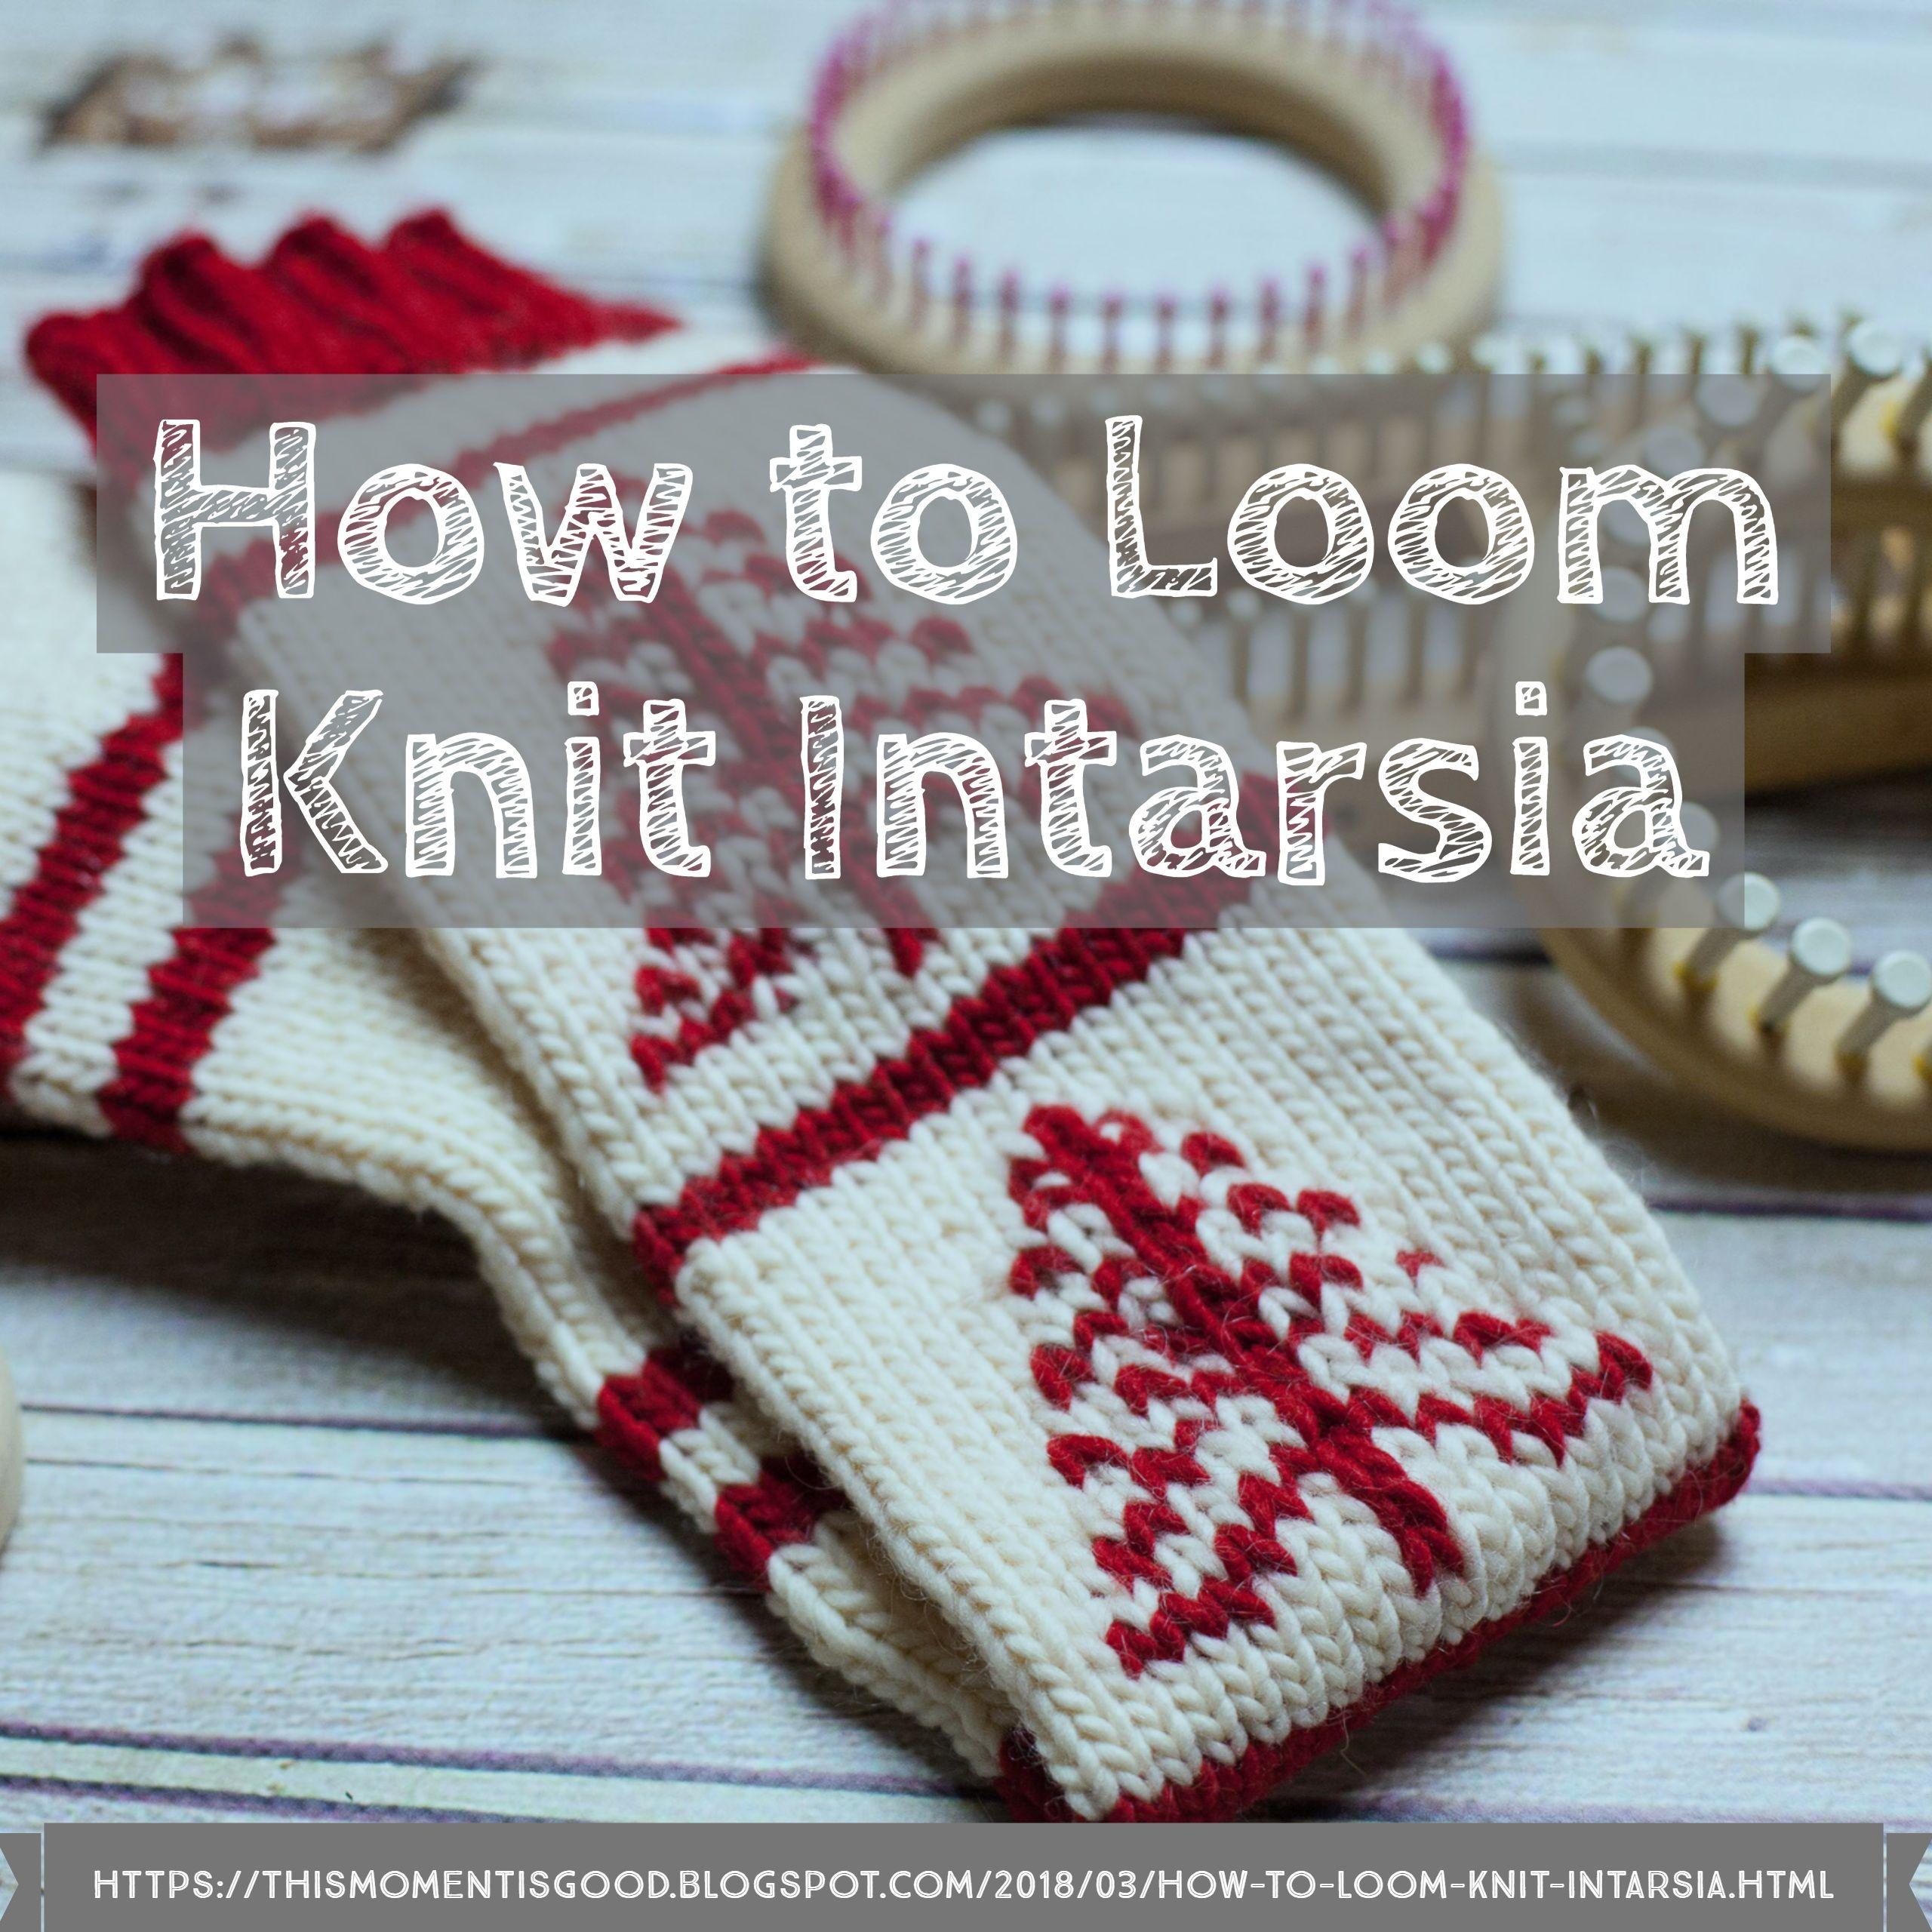 How to Loom Knit Intarsia | Telar y Tejido